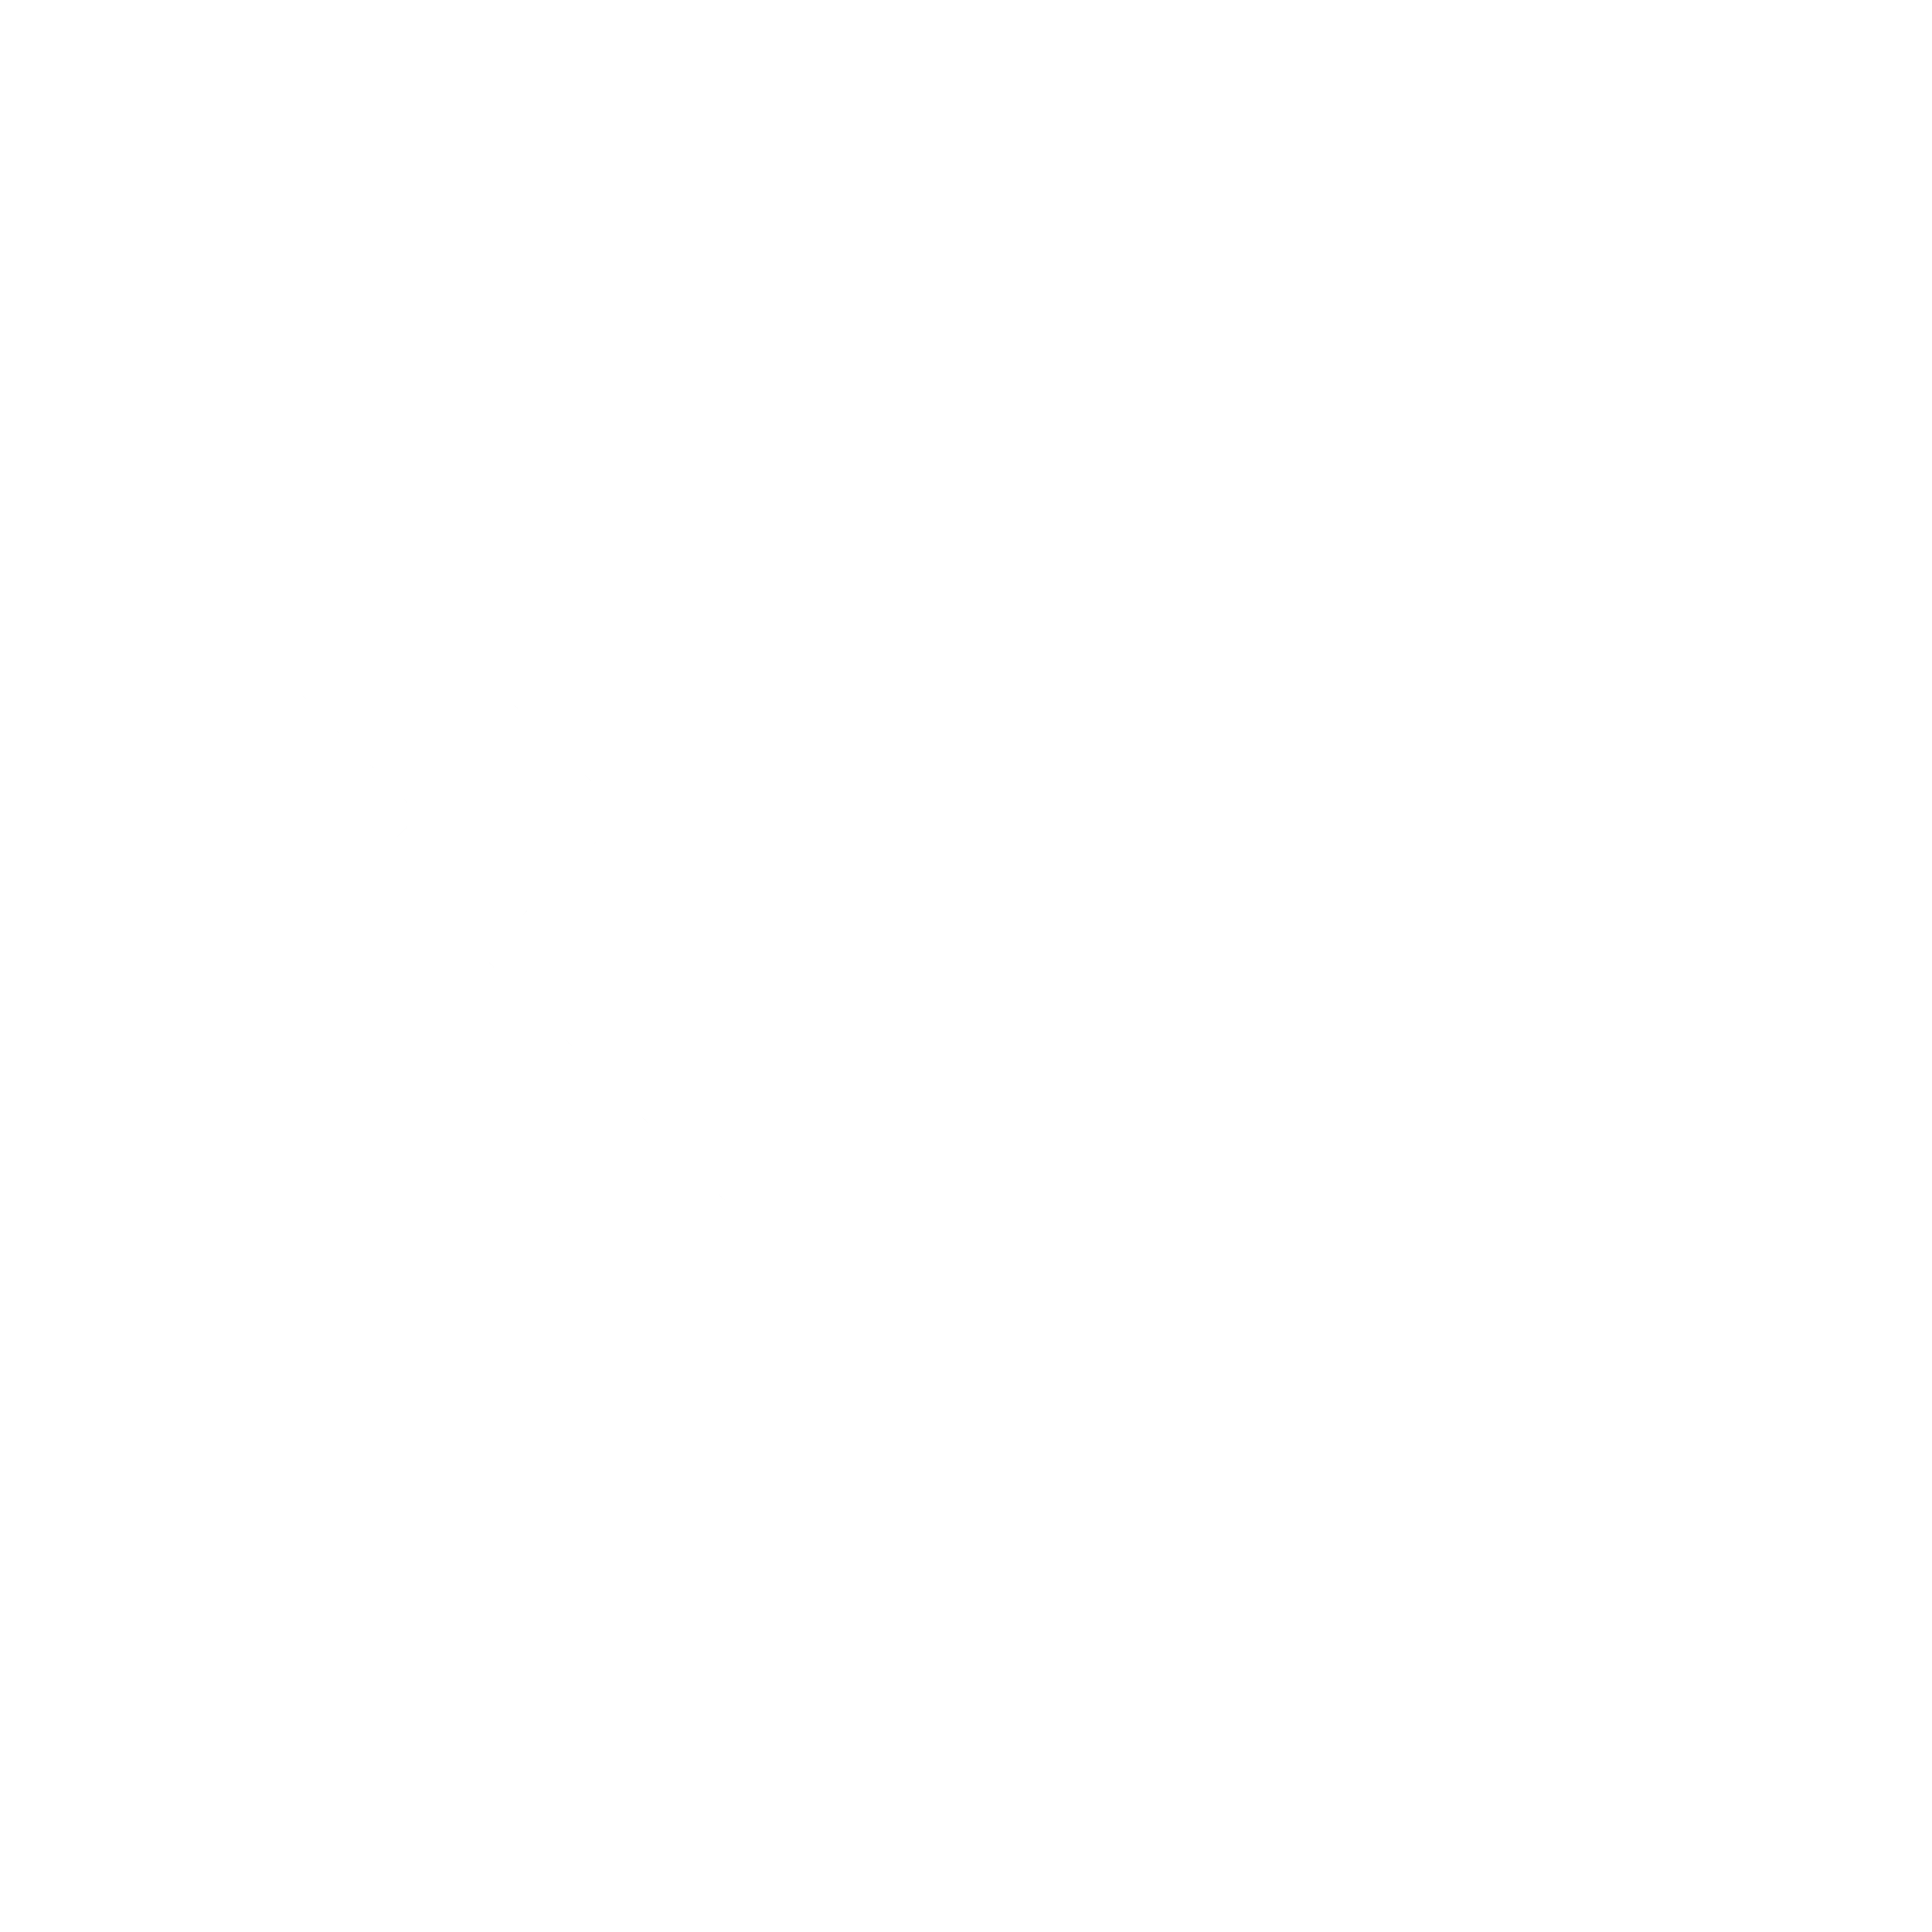 rm logo png transparent svg vector freebie supply rm logo png transparent svg vector